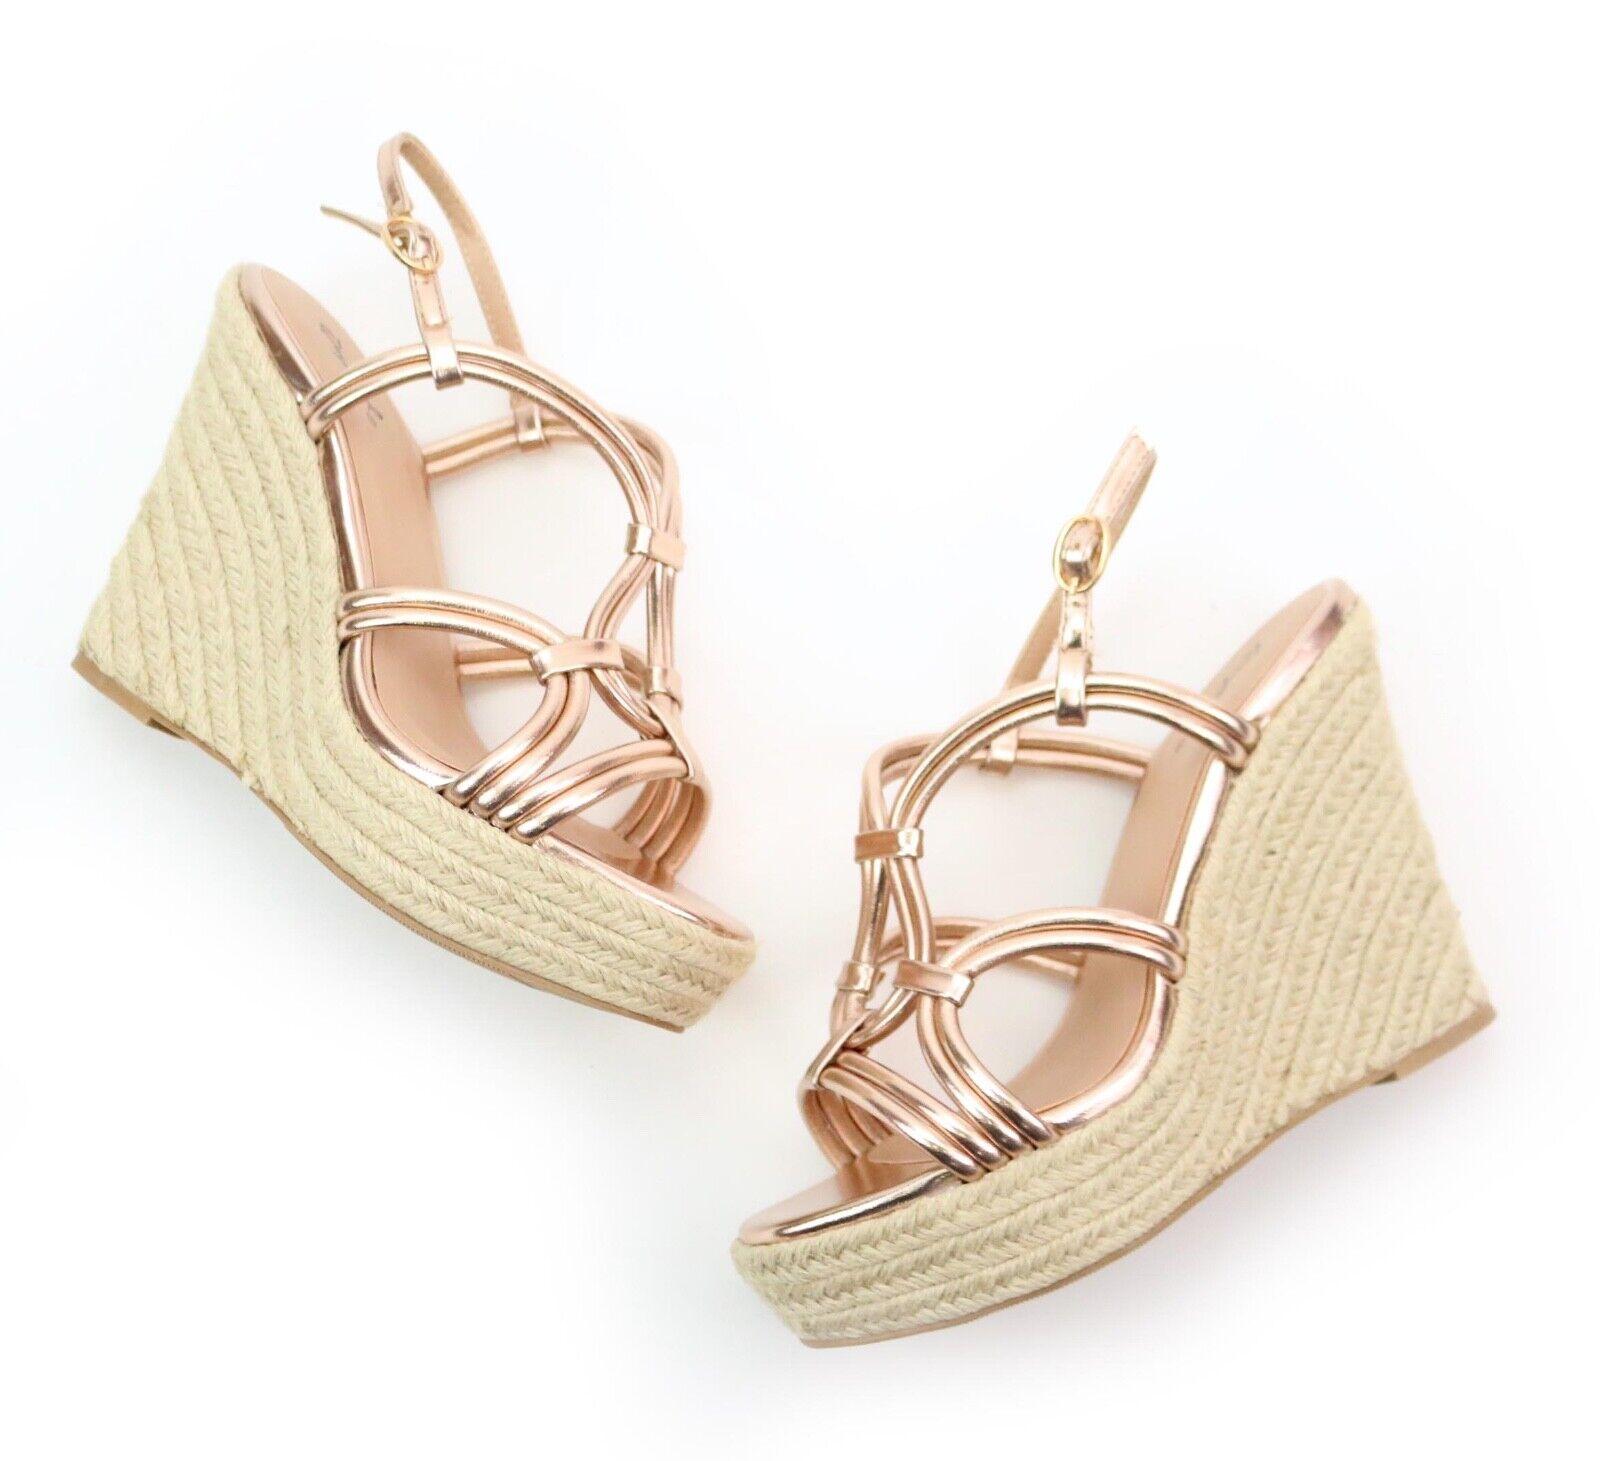 Qupid Kelsey pink gold Metallic Espadrille Wedge Heels Size 6.5 NEW